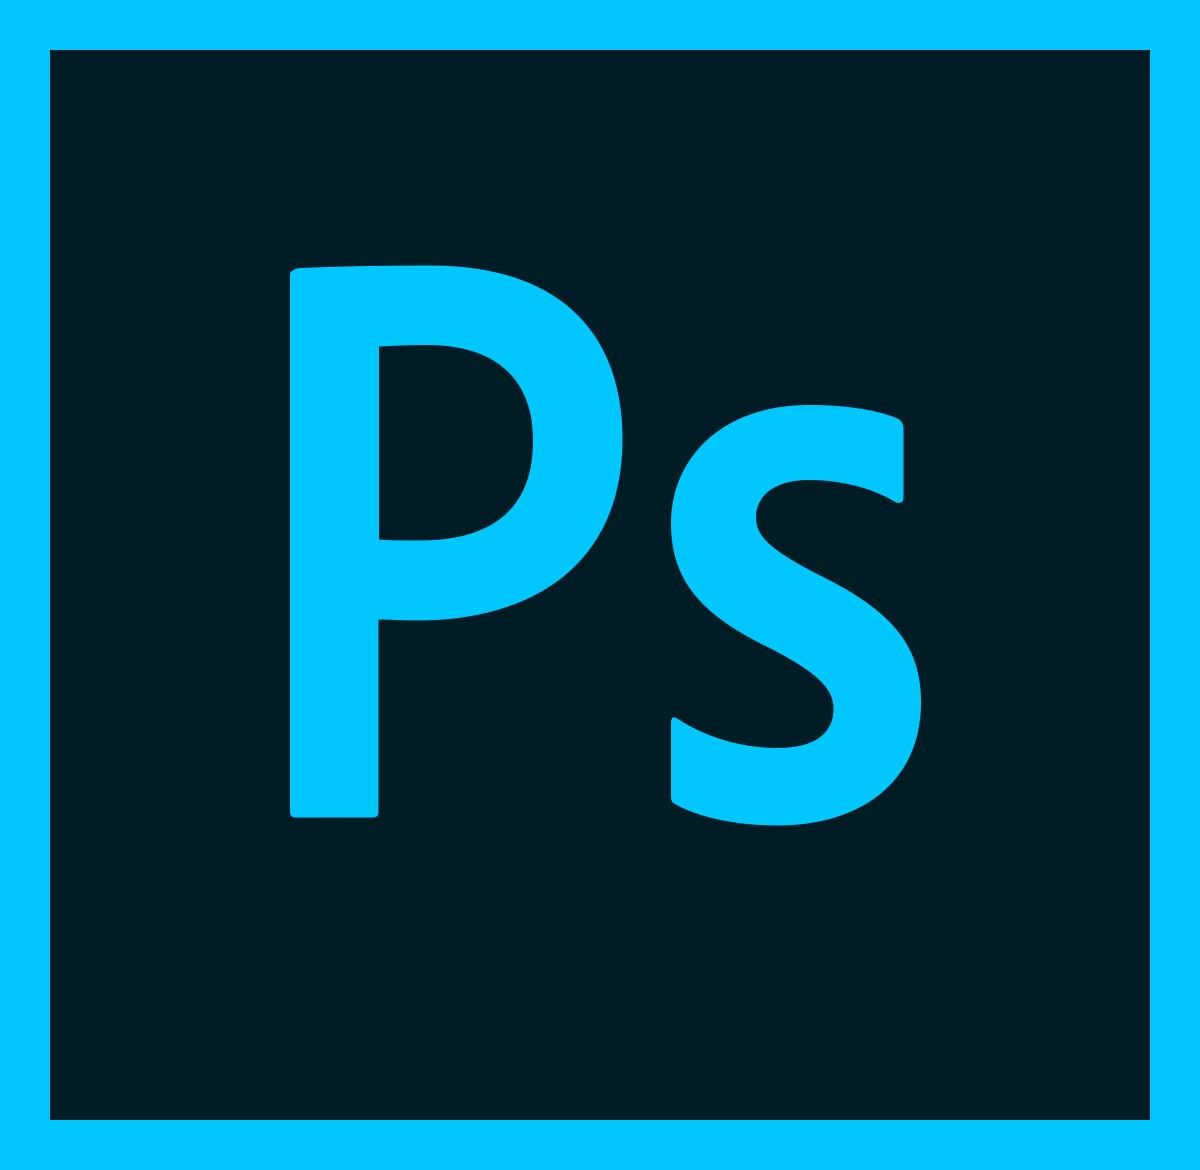 Adobe Photoshop.